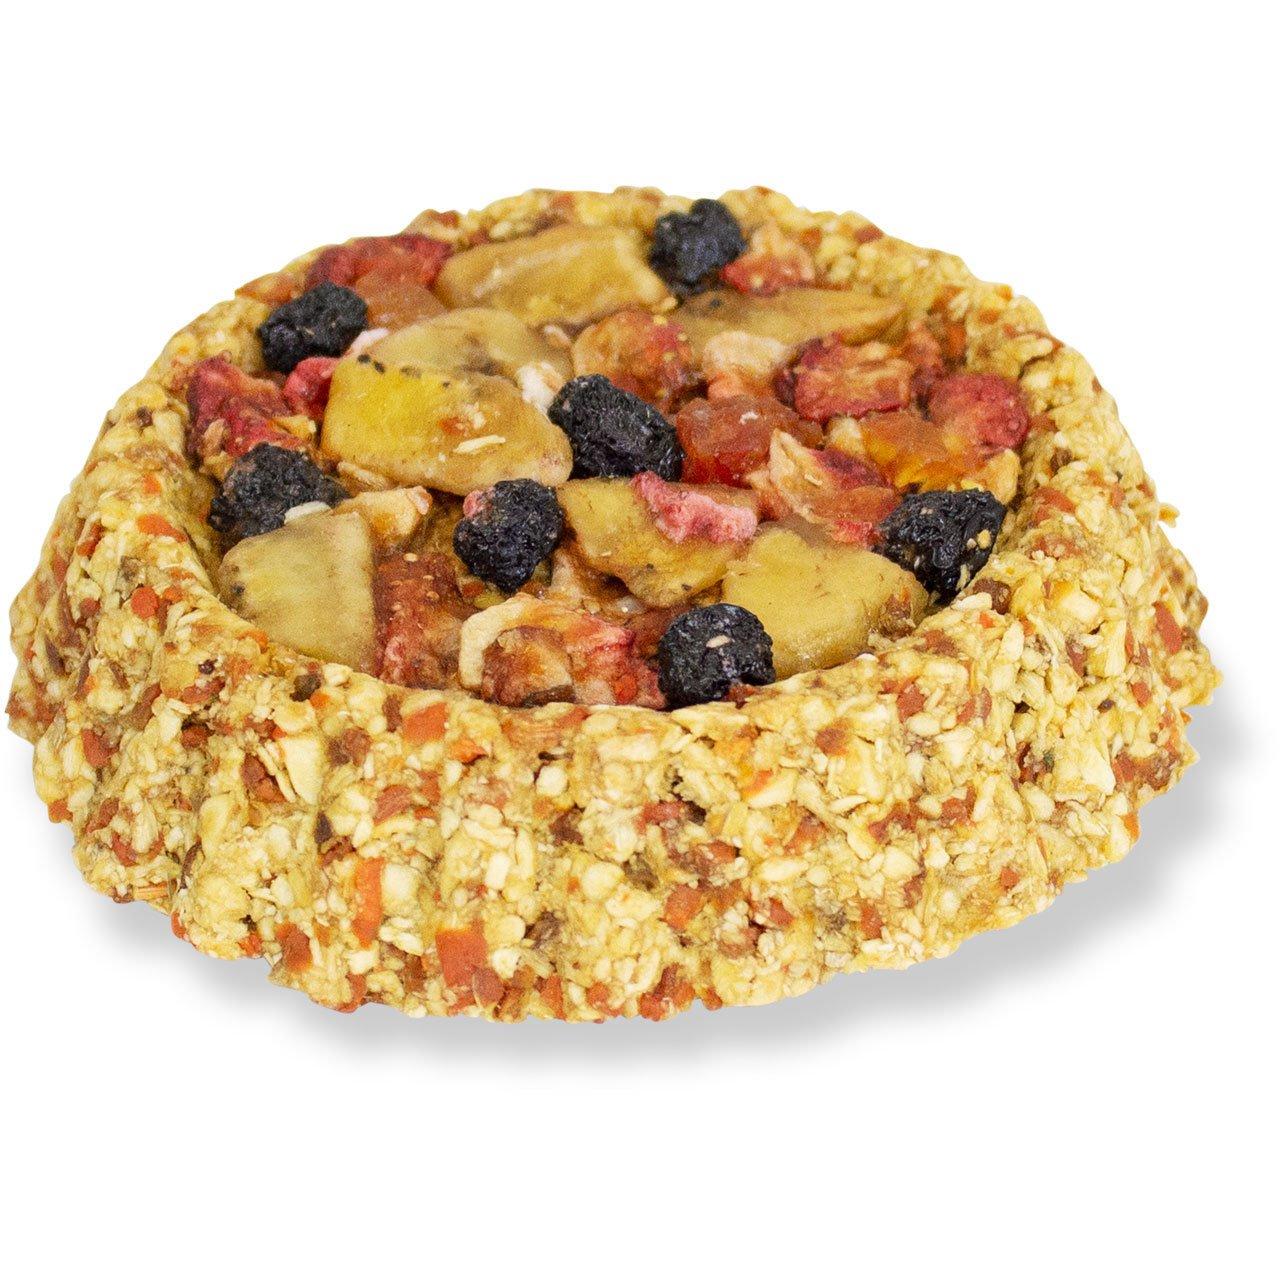 JR Farm Früchtekuchen, Bild 2